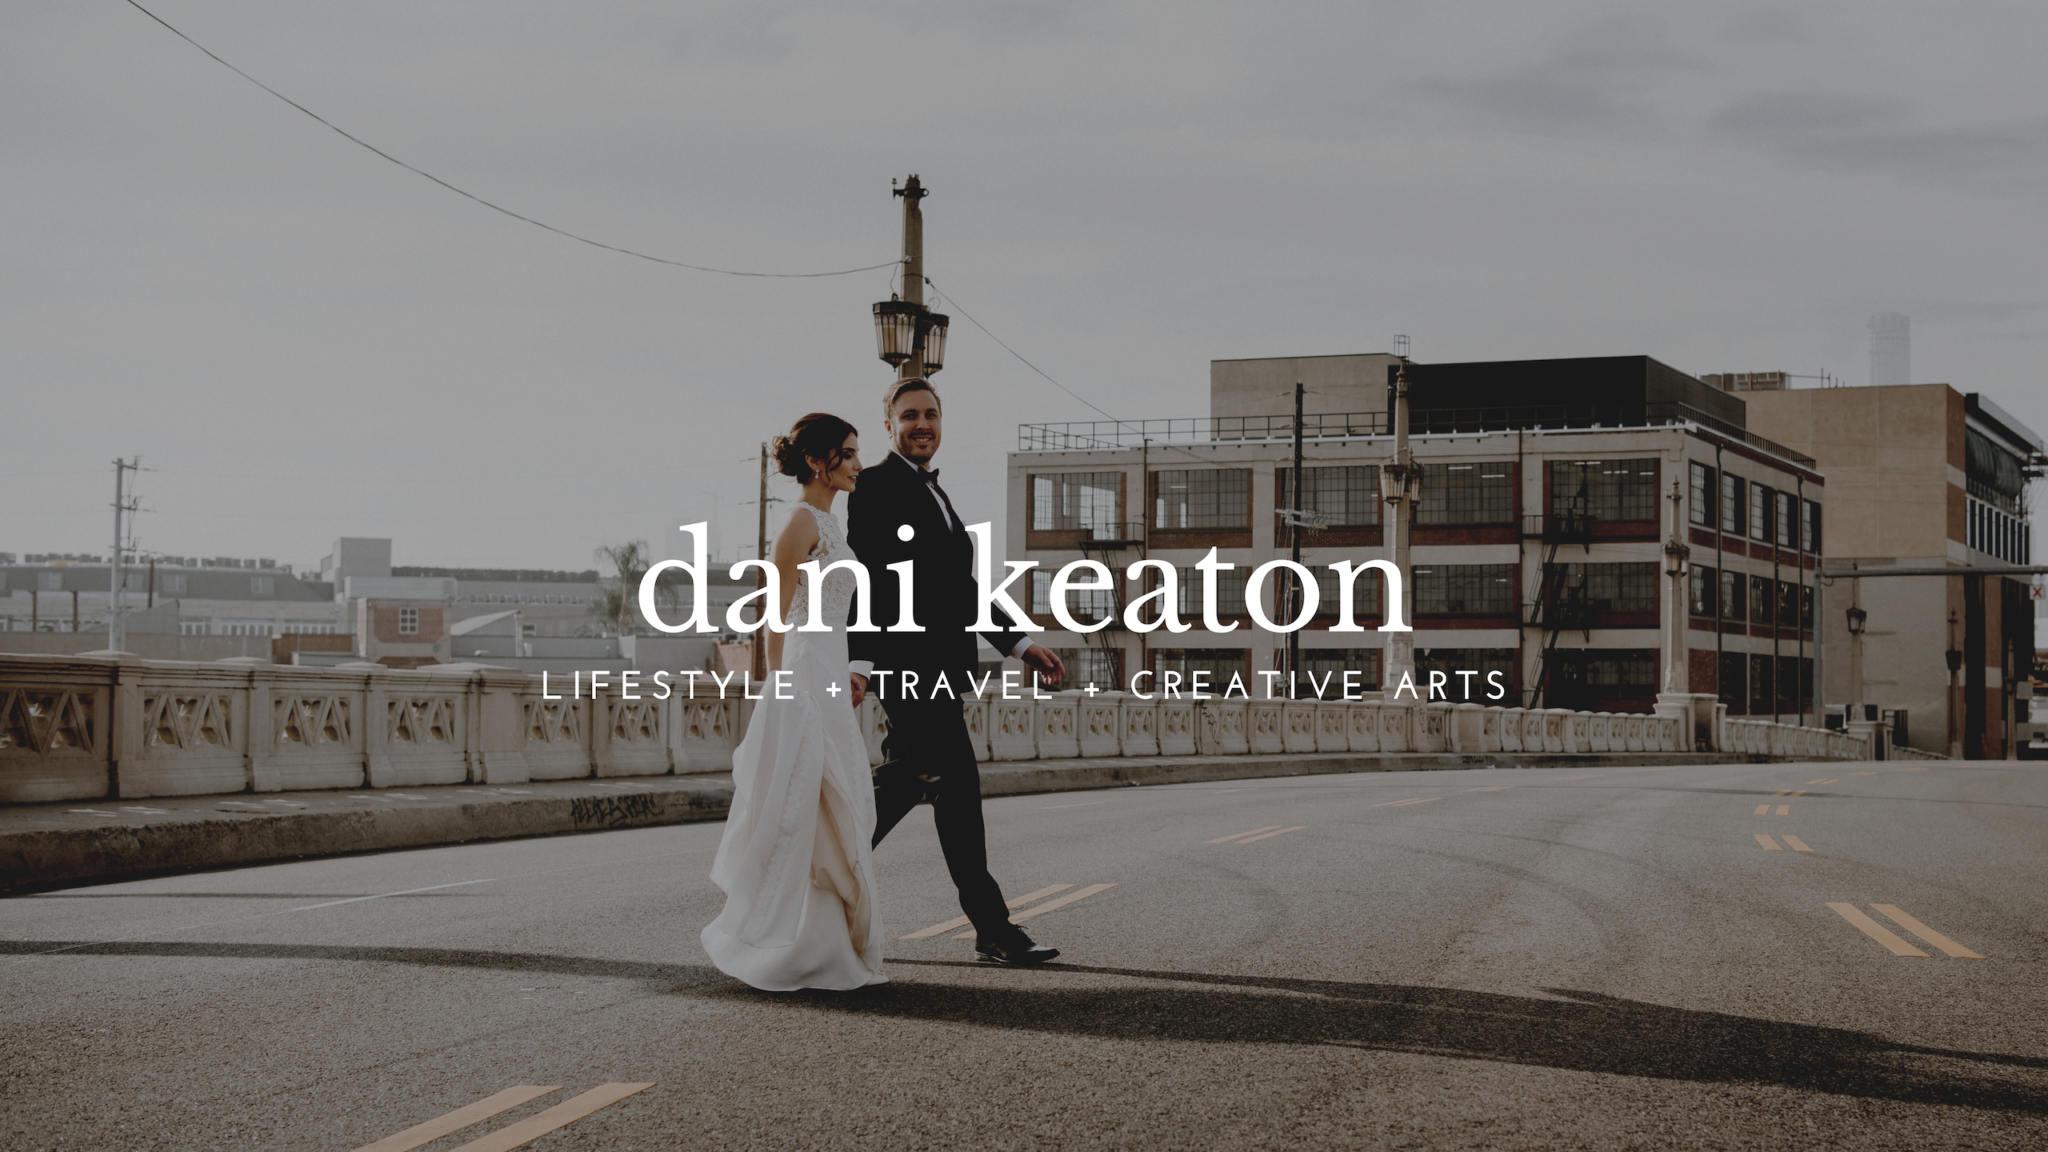 Dani Keaton